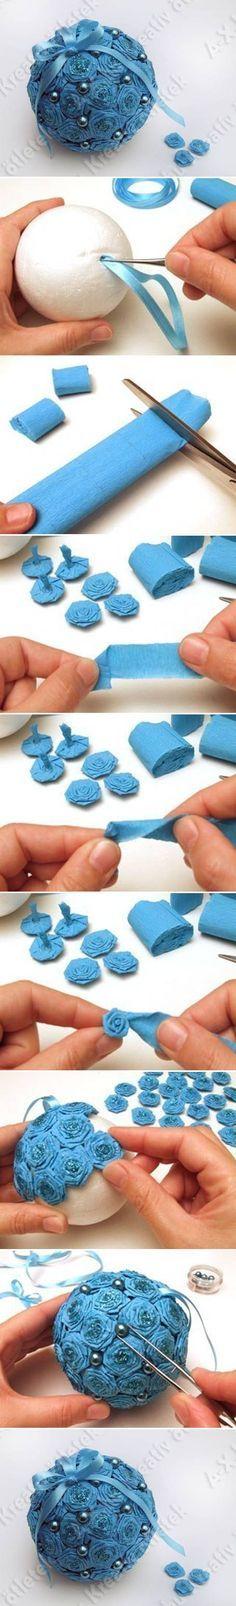 DIY Styrofoam Paper Rose Ball Ornament - (wonderfuldiy)